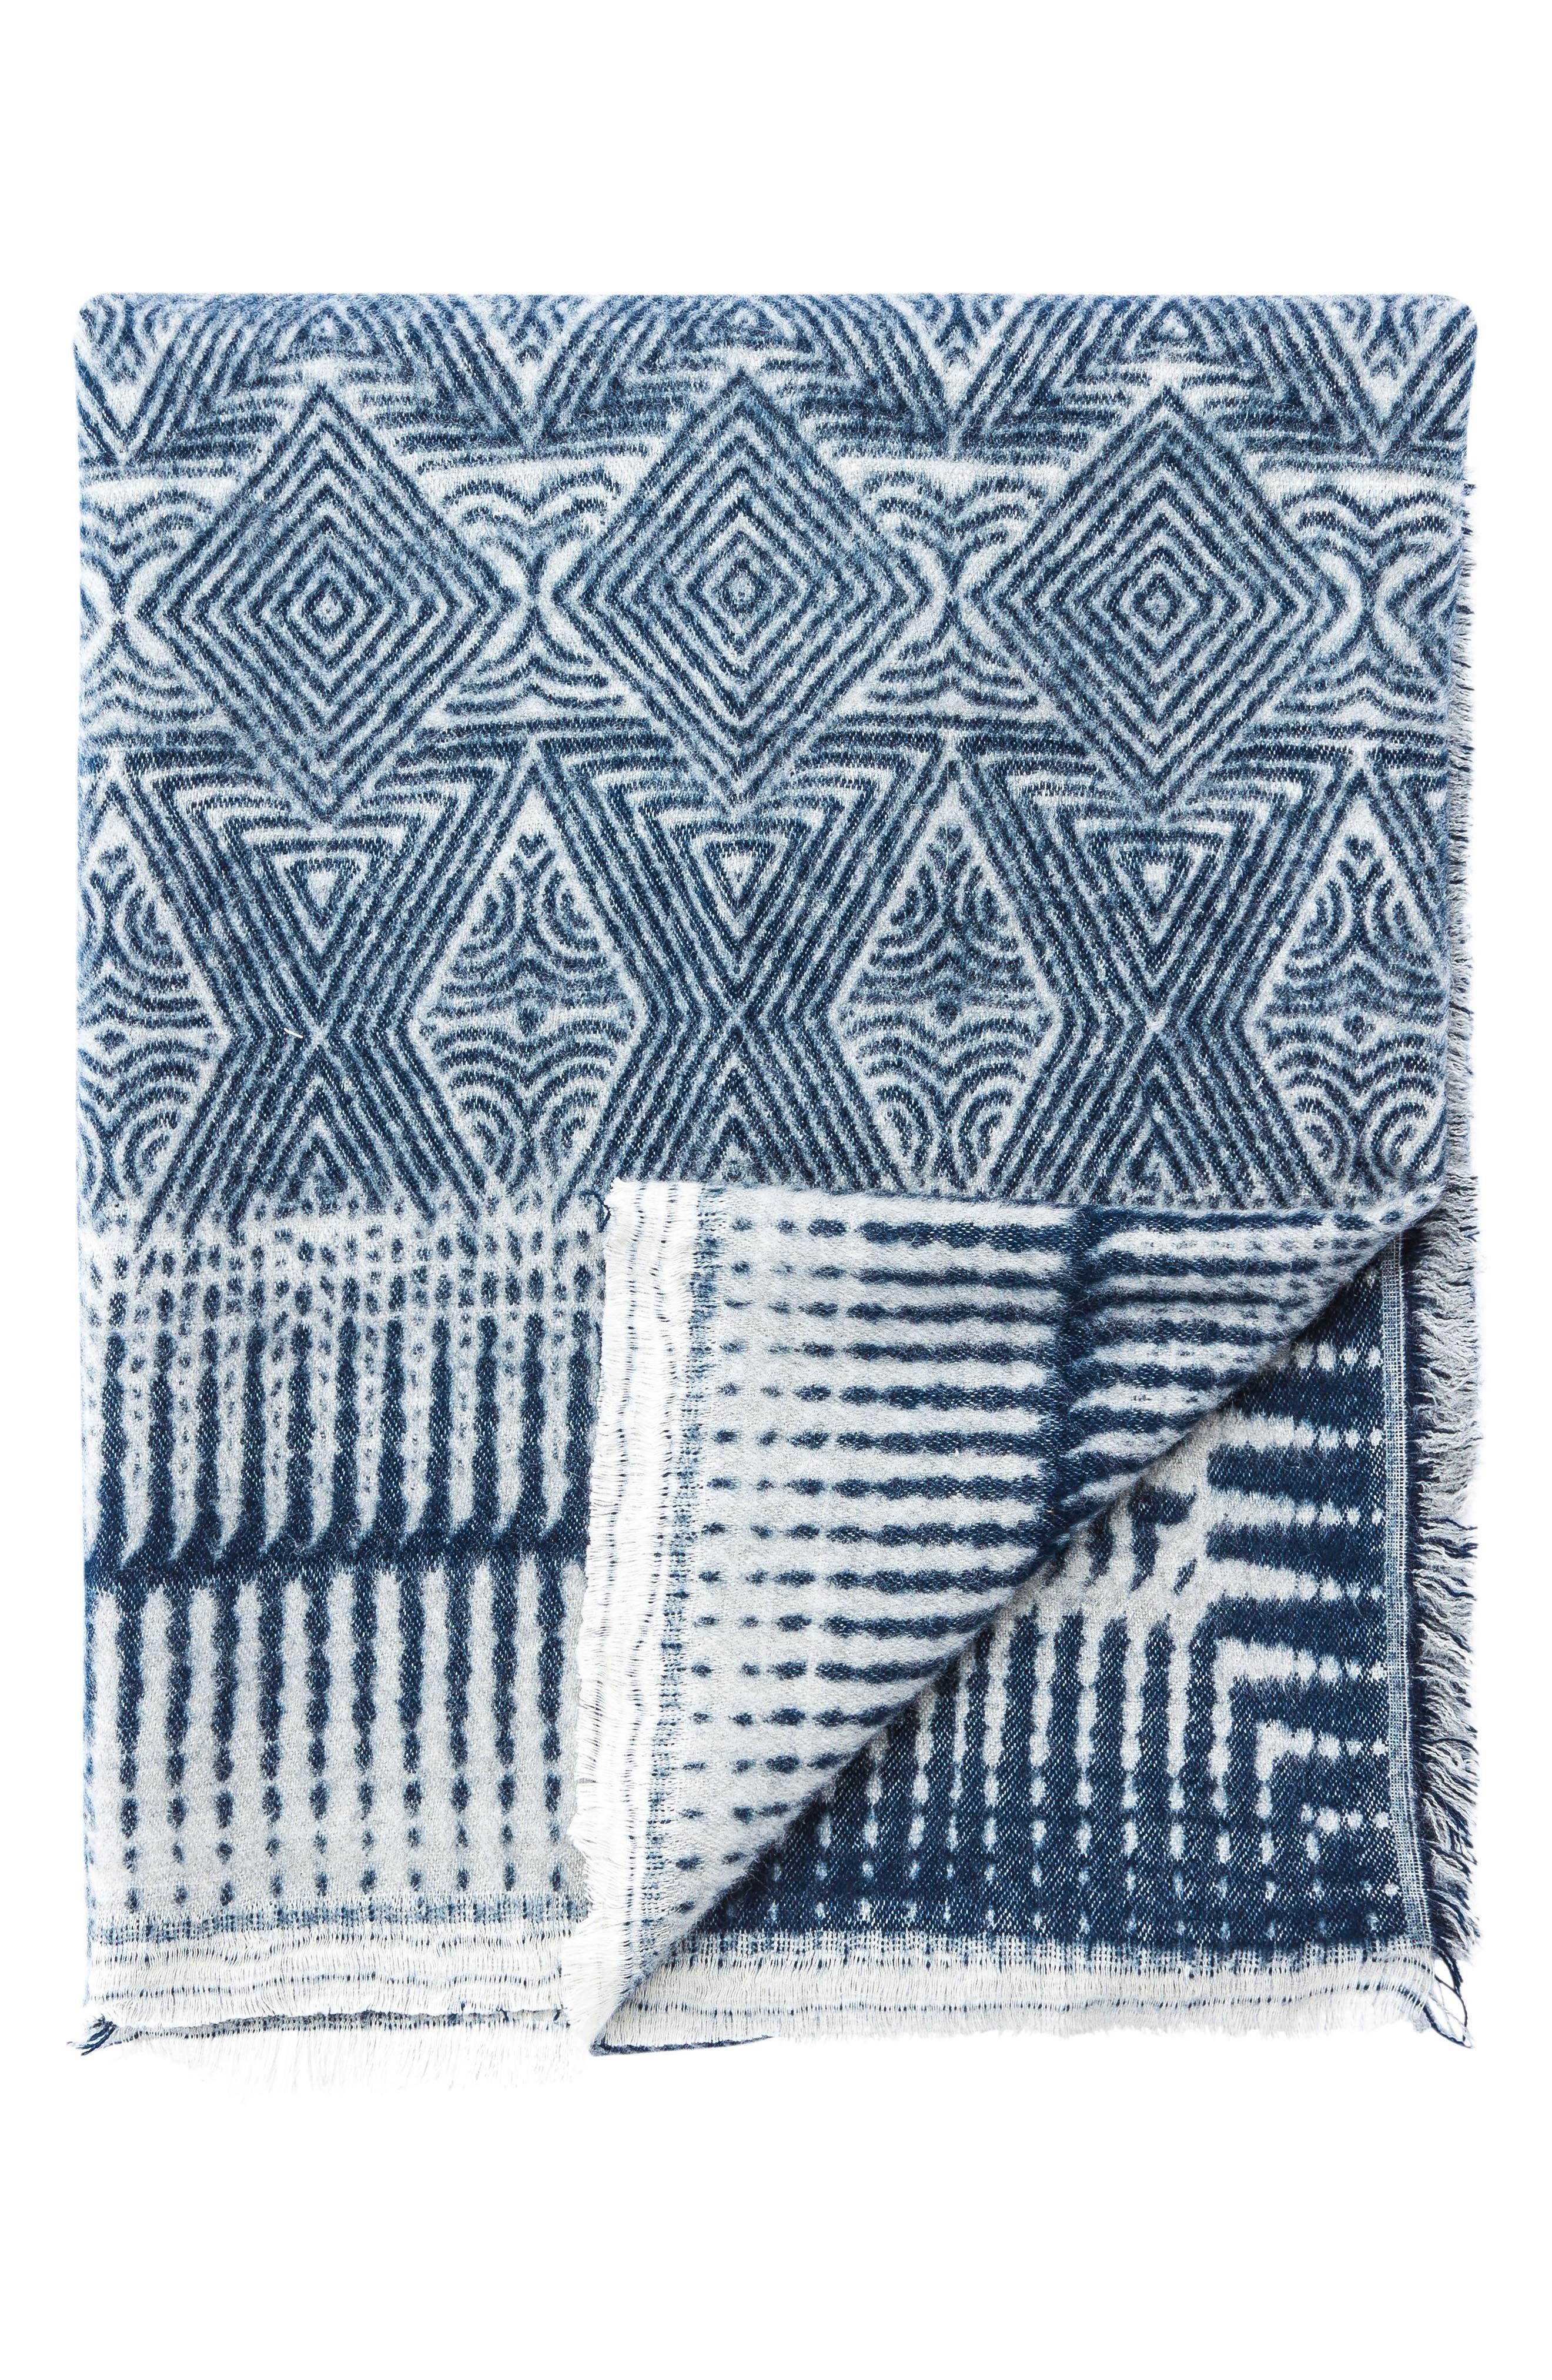 Alternate Image 1 Selected - Jaipur Hamlin Throw Blanket